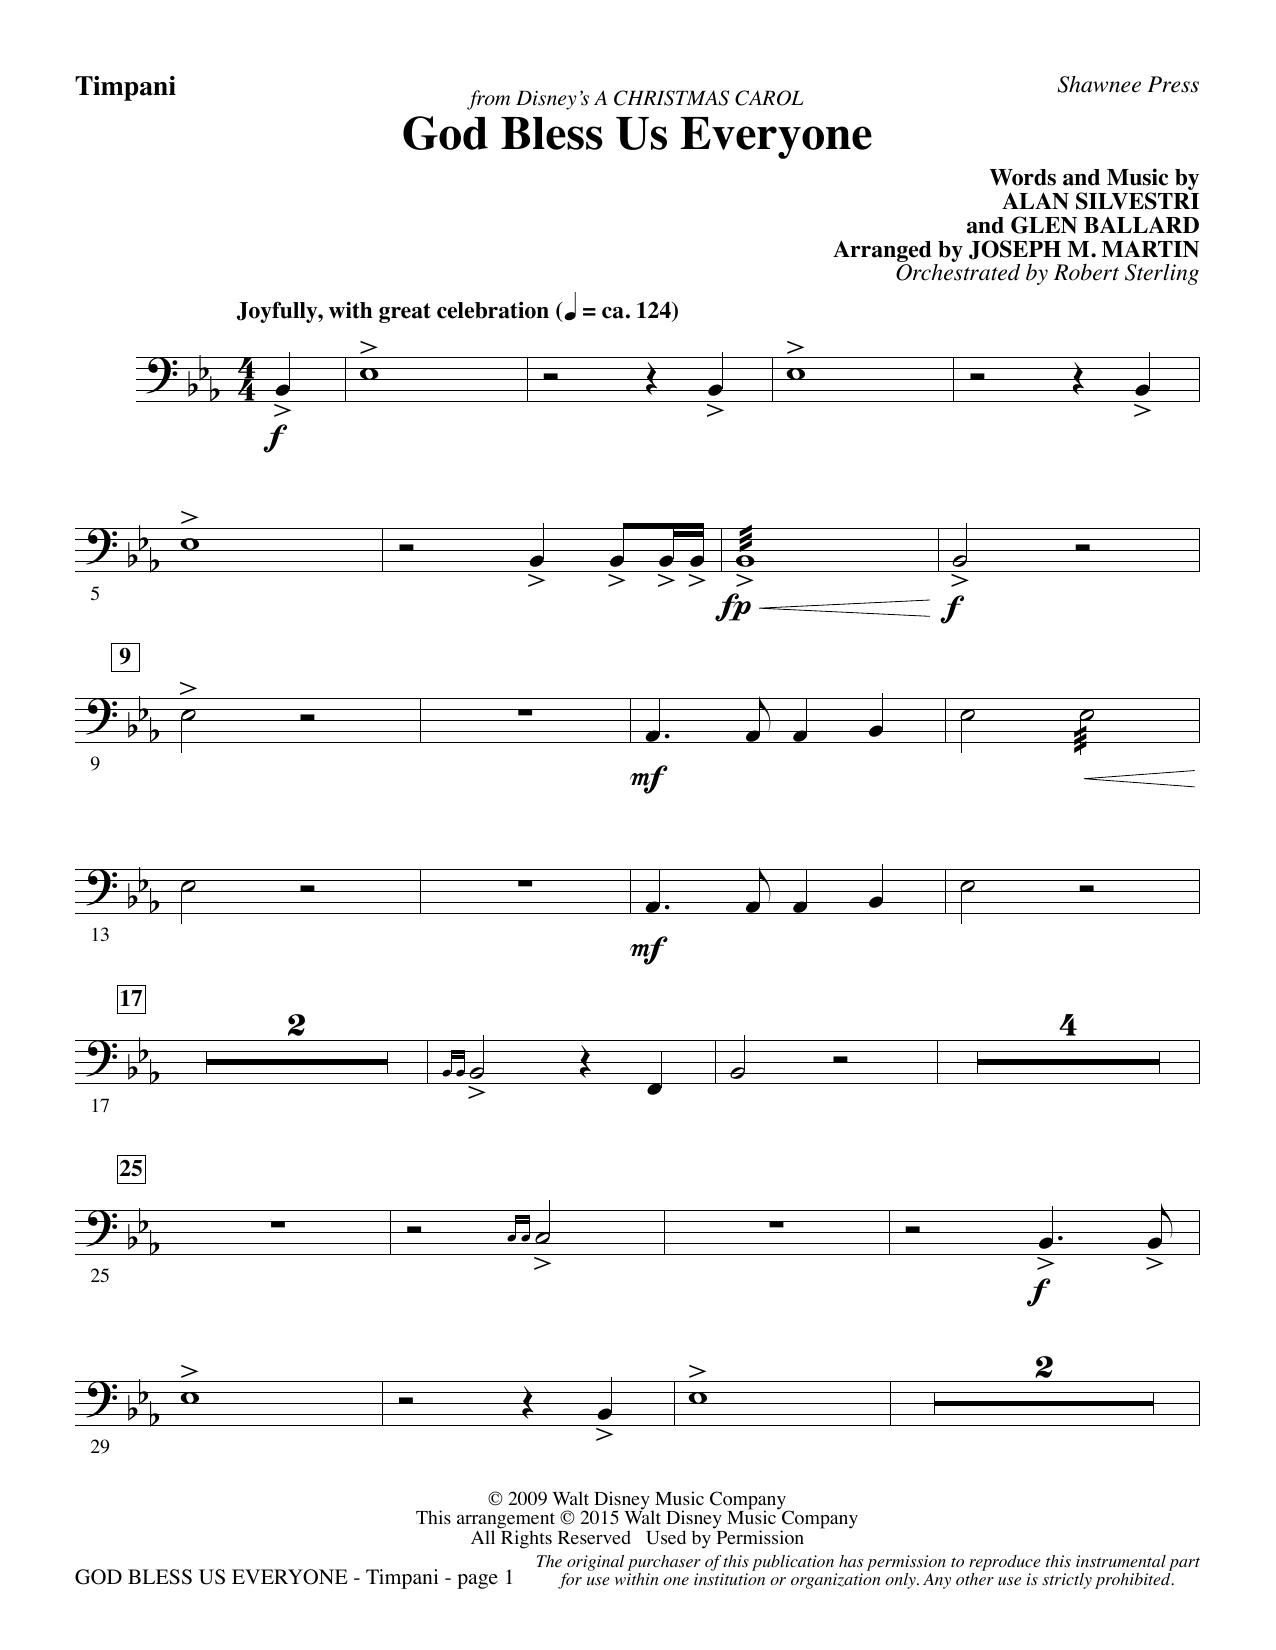 God Bless Us Everyone (from Disney's A Christmas Carol) - Timpani sheet music